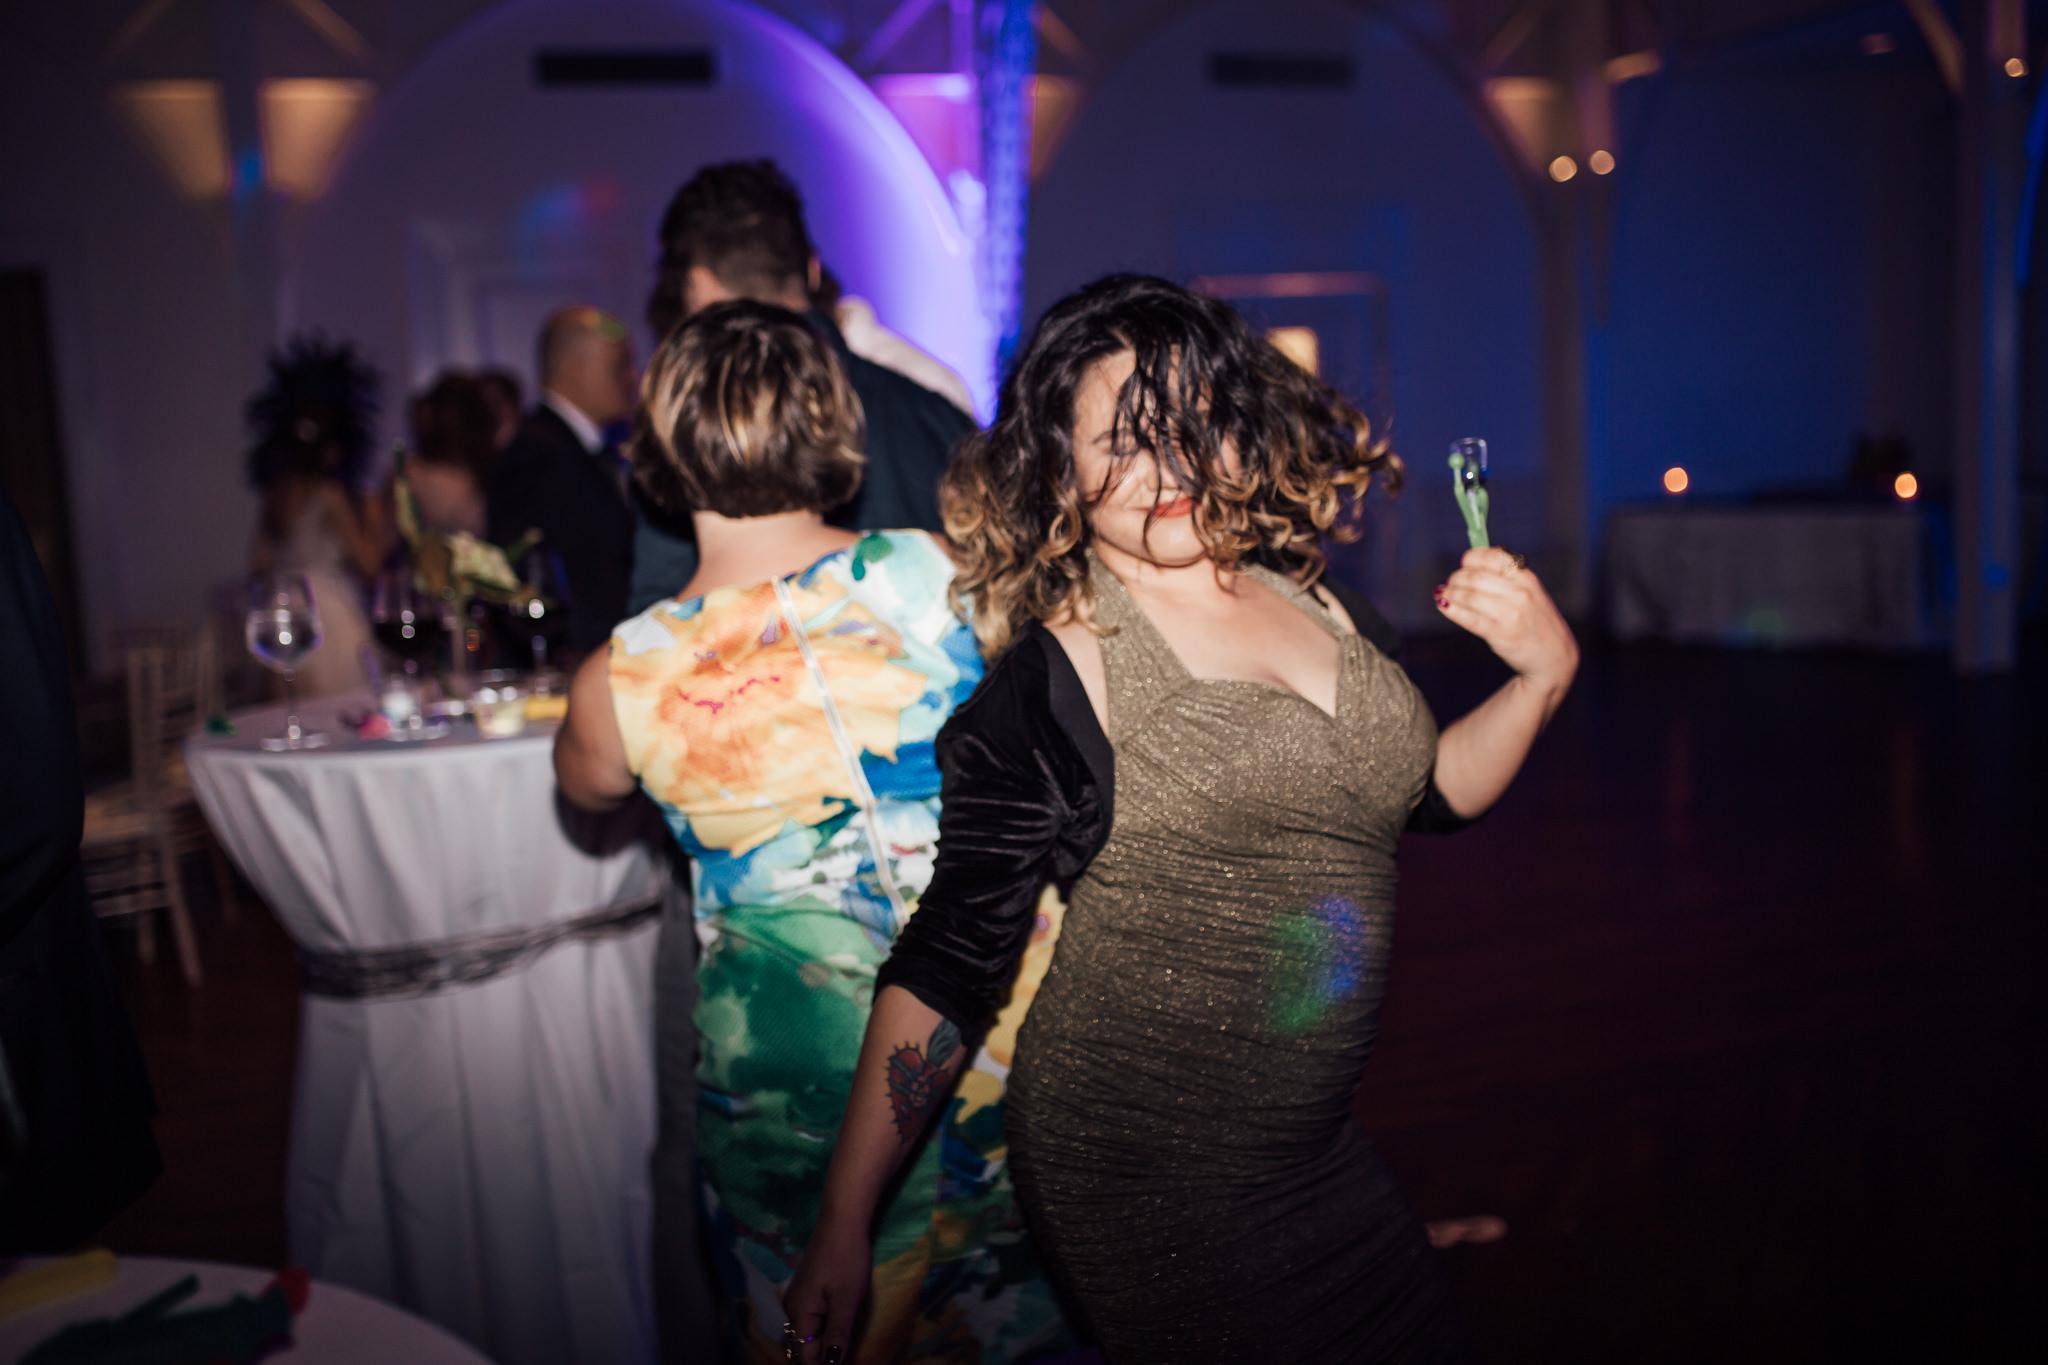 cassie-cook-photography-memphis-wedding-photographer-the-atrium-at-overton-square-59.jpg